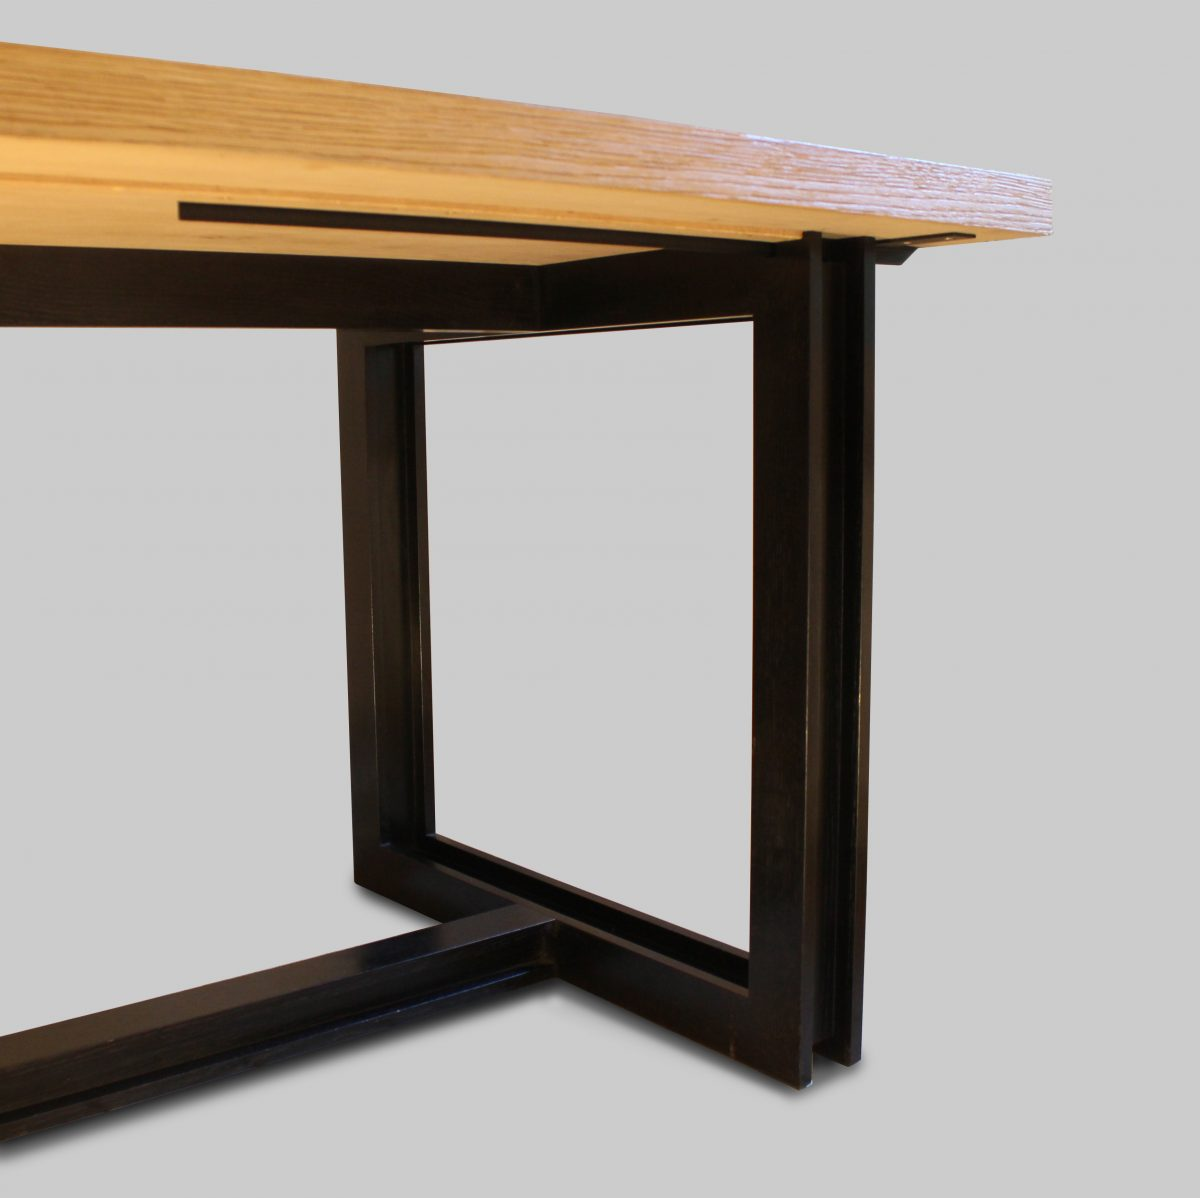 table ipn pierre marin cr ateur b niste. Black Bedroom Furniture Sets. Home Design Ideas